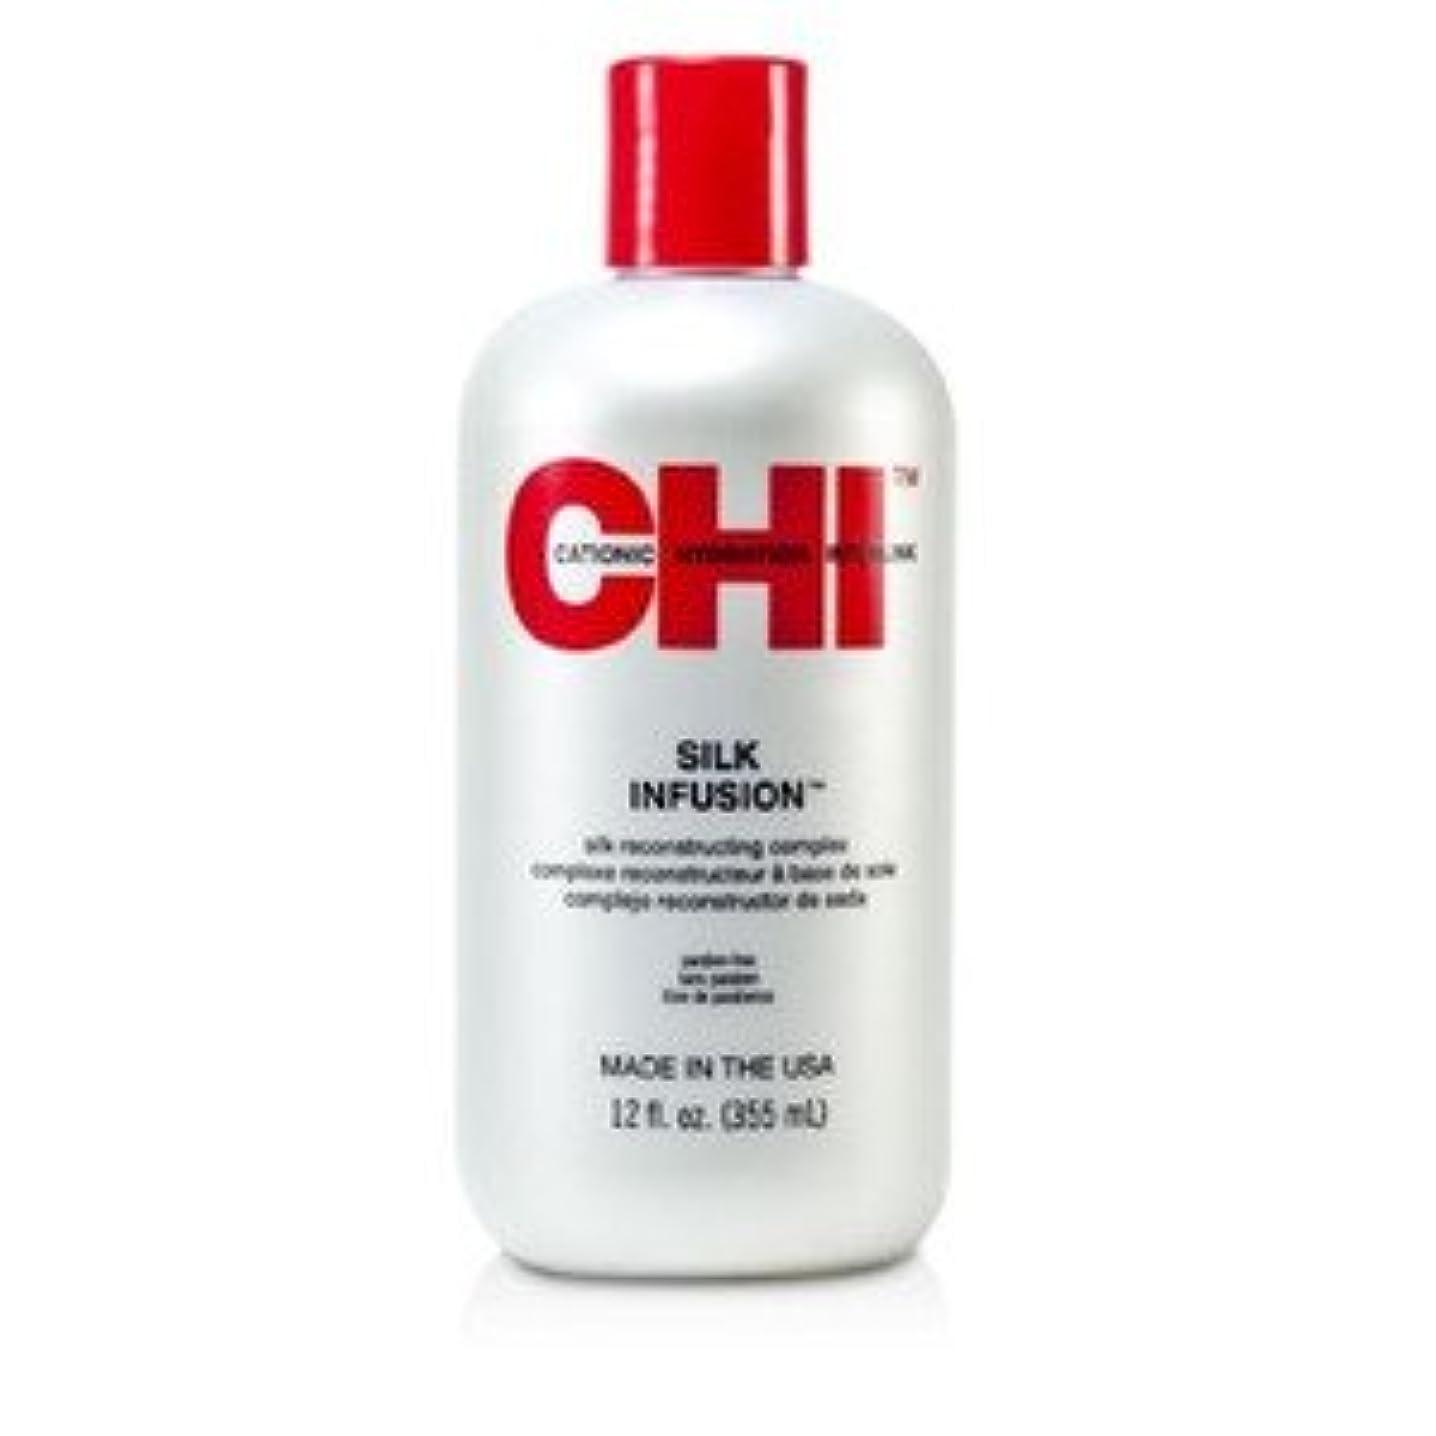 CHI シルク インフュージョン シルク リコンストラクティング コンプレックス 355ml/12oz [並行輸入品]